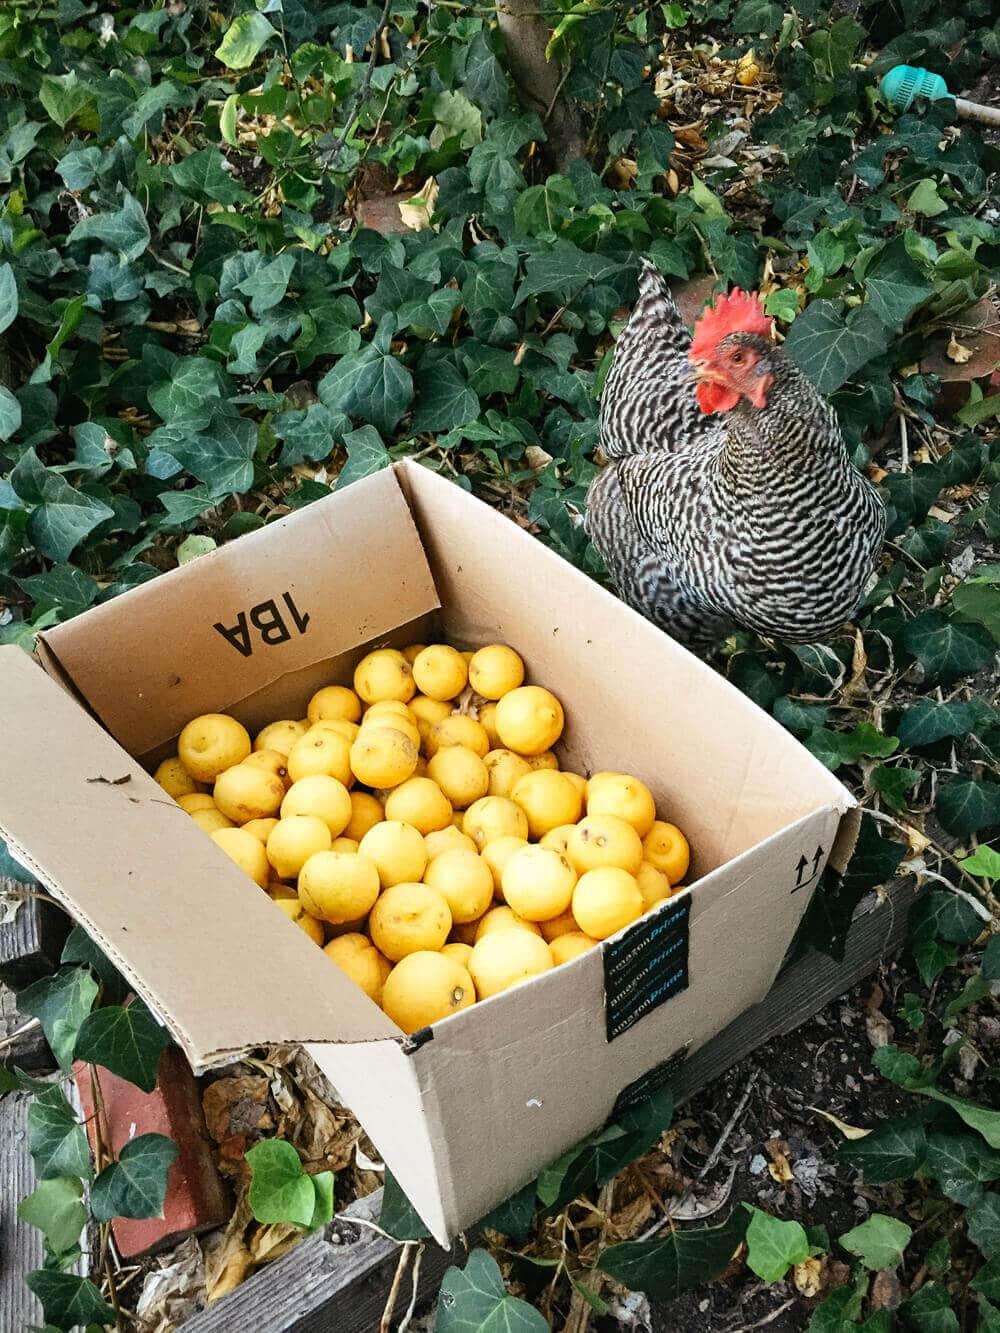 Kimora with our lemon harvest